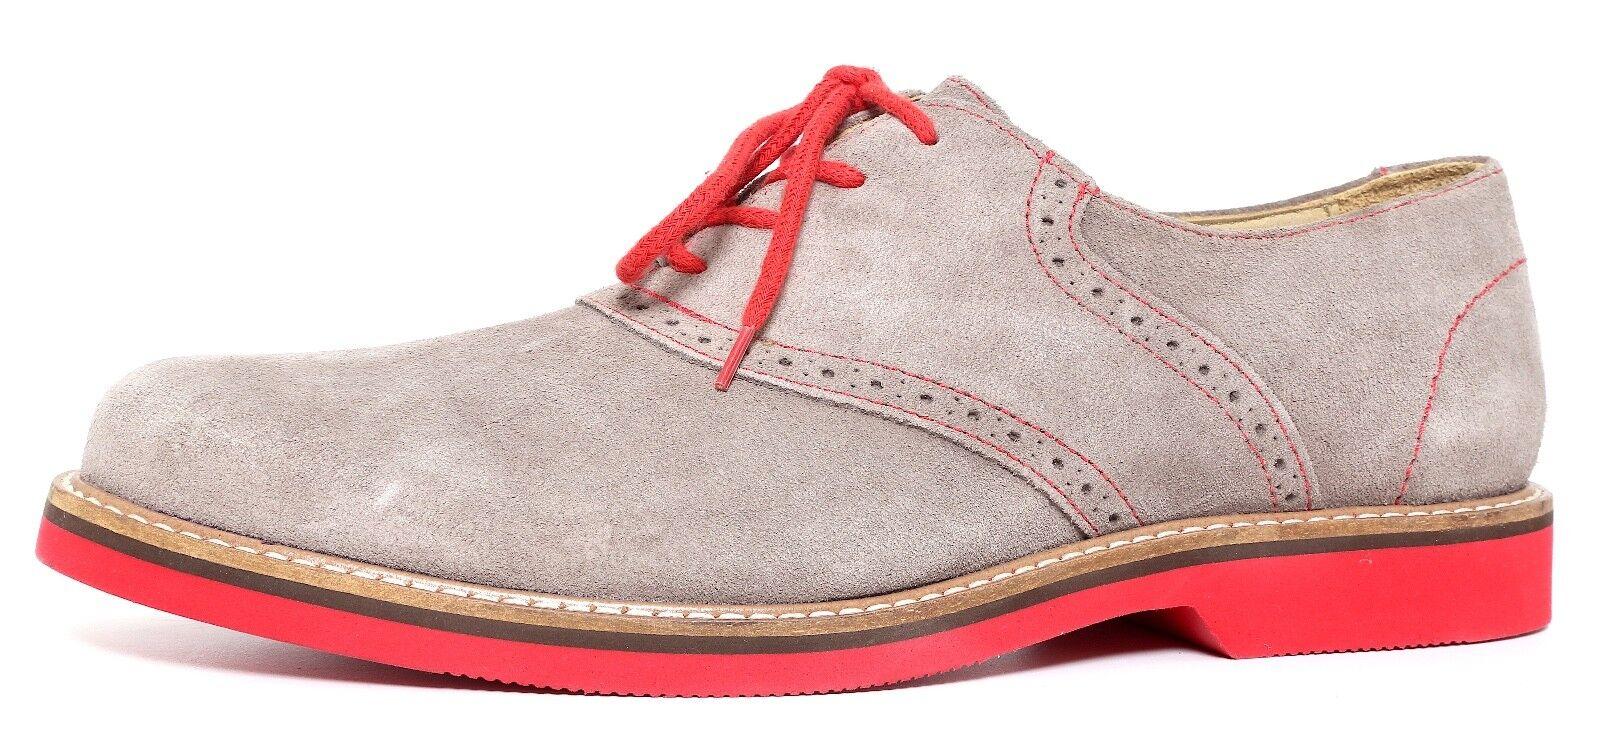 1901 Lace Up Suede Oxfords Grey Red Men Sz 8.5 M 3423